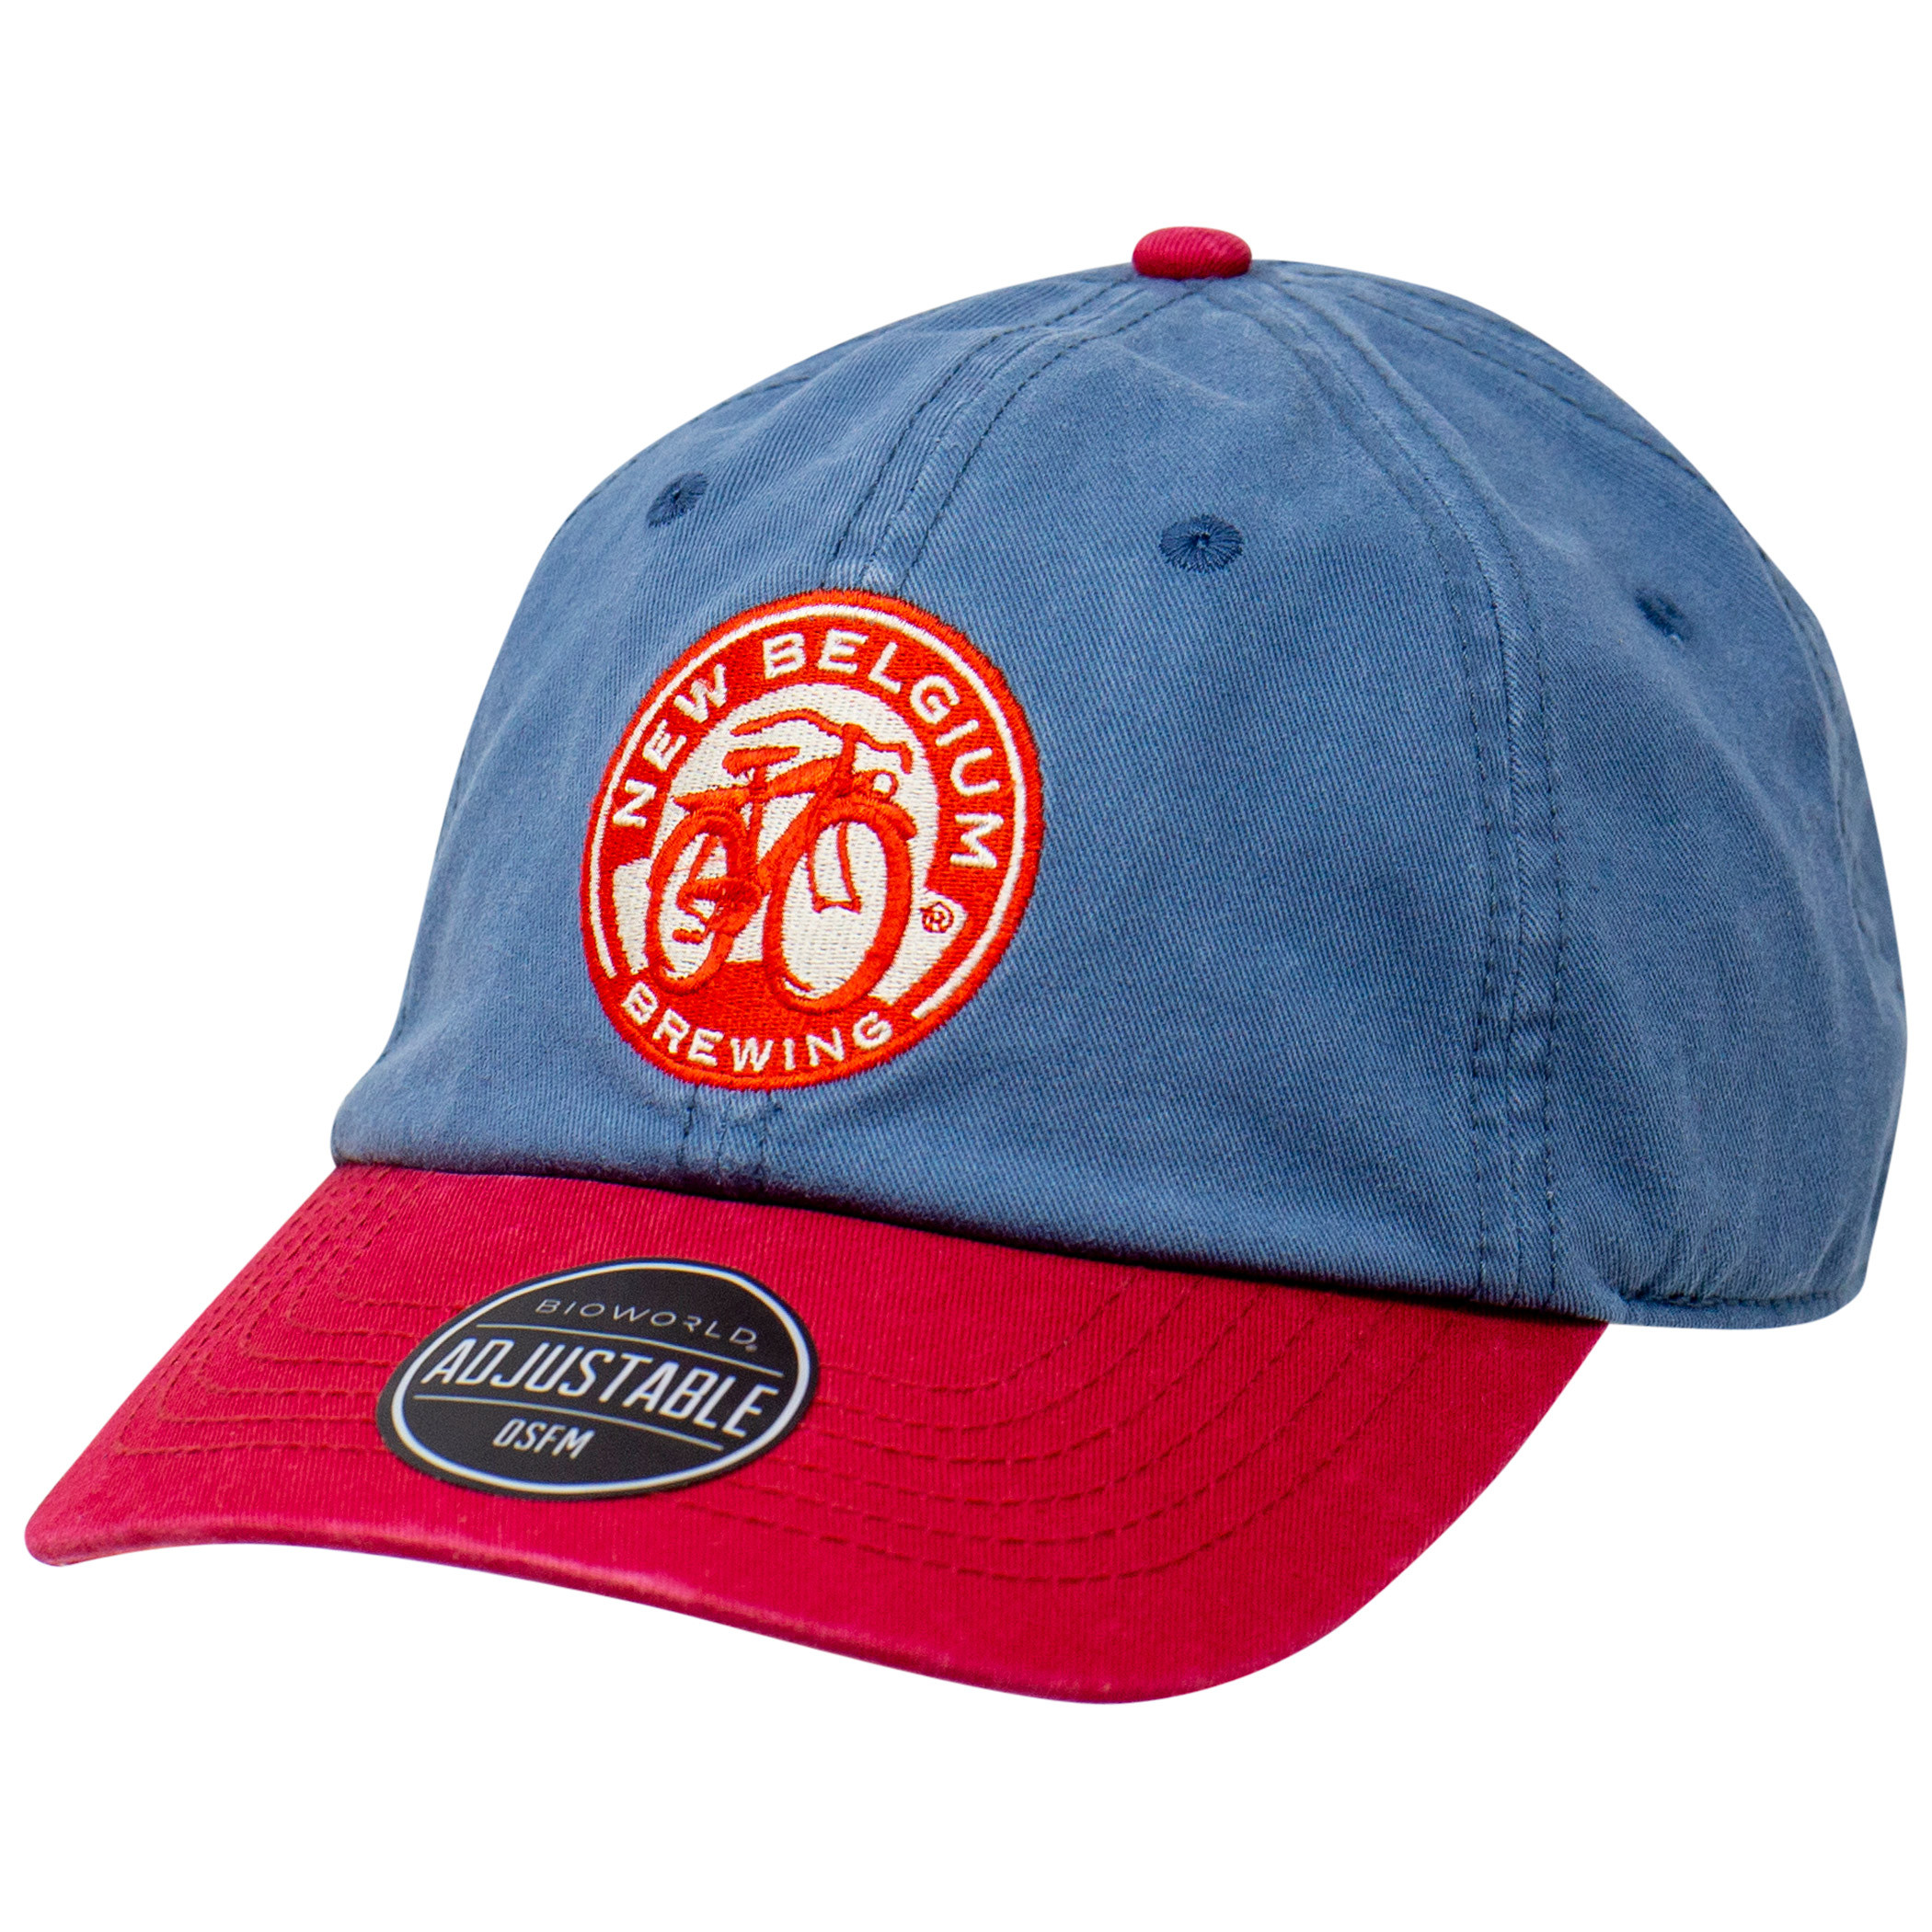 New Belgium Brewing Adjustable Dad Hat